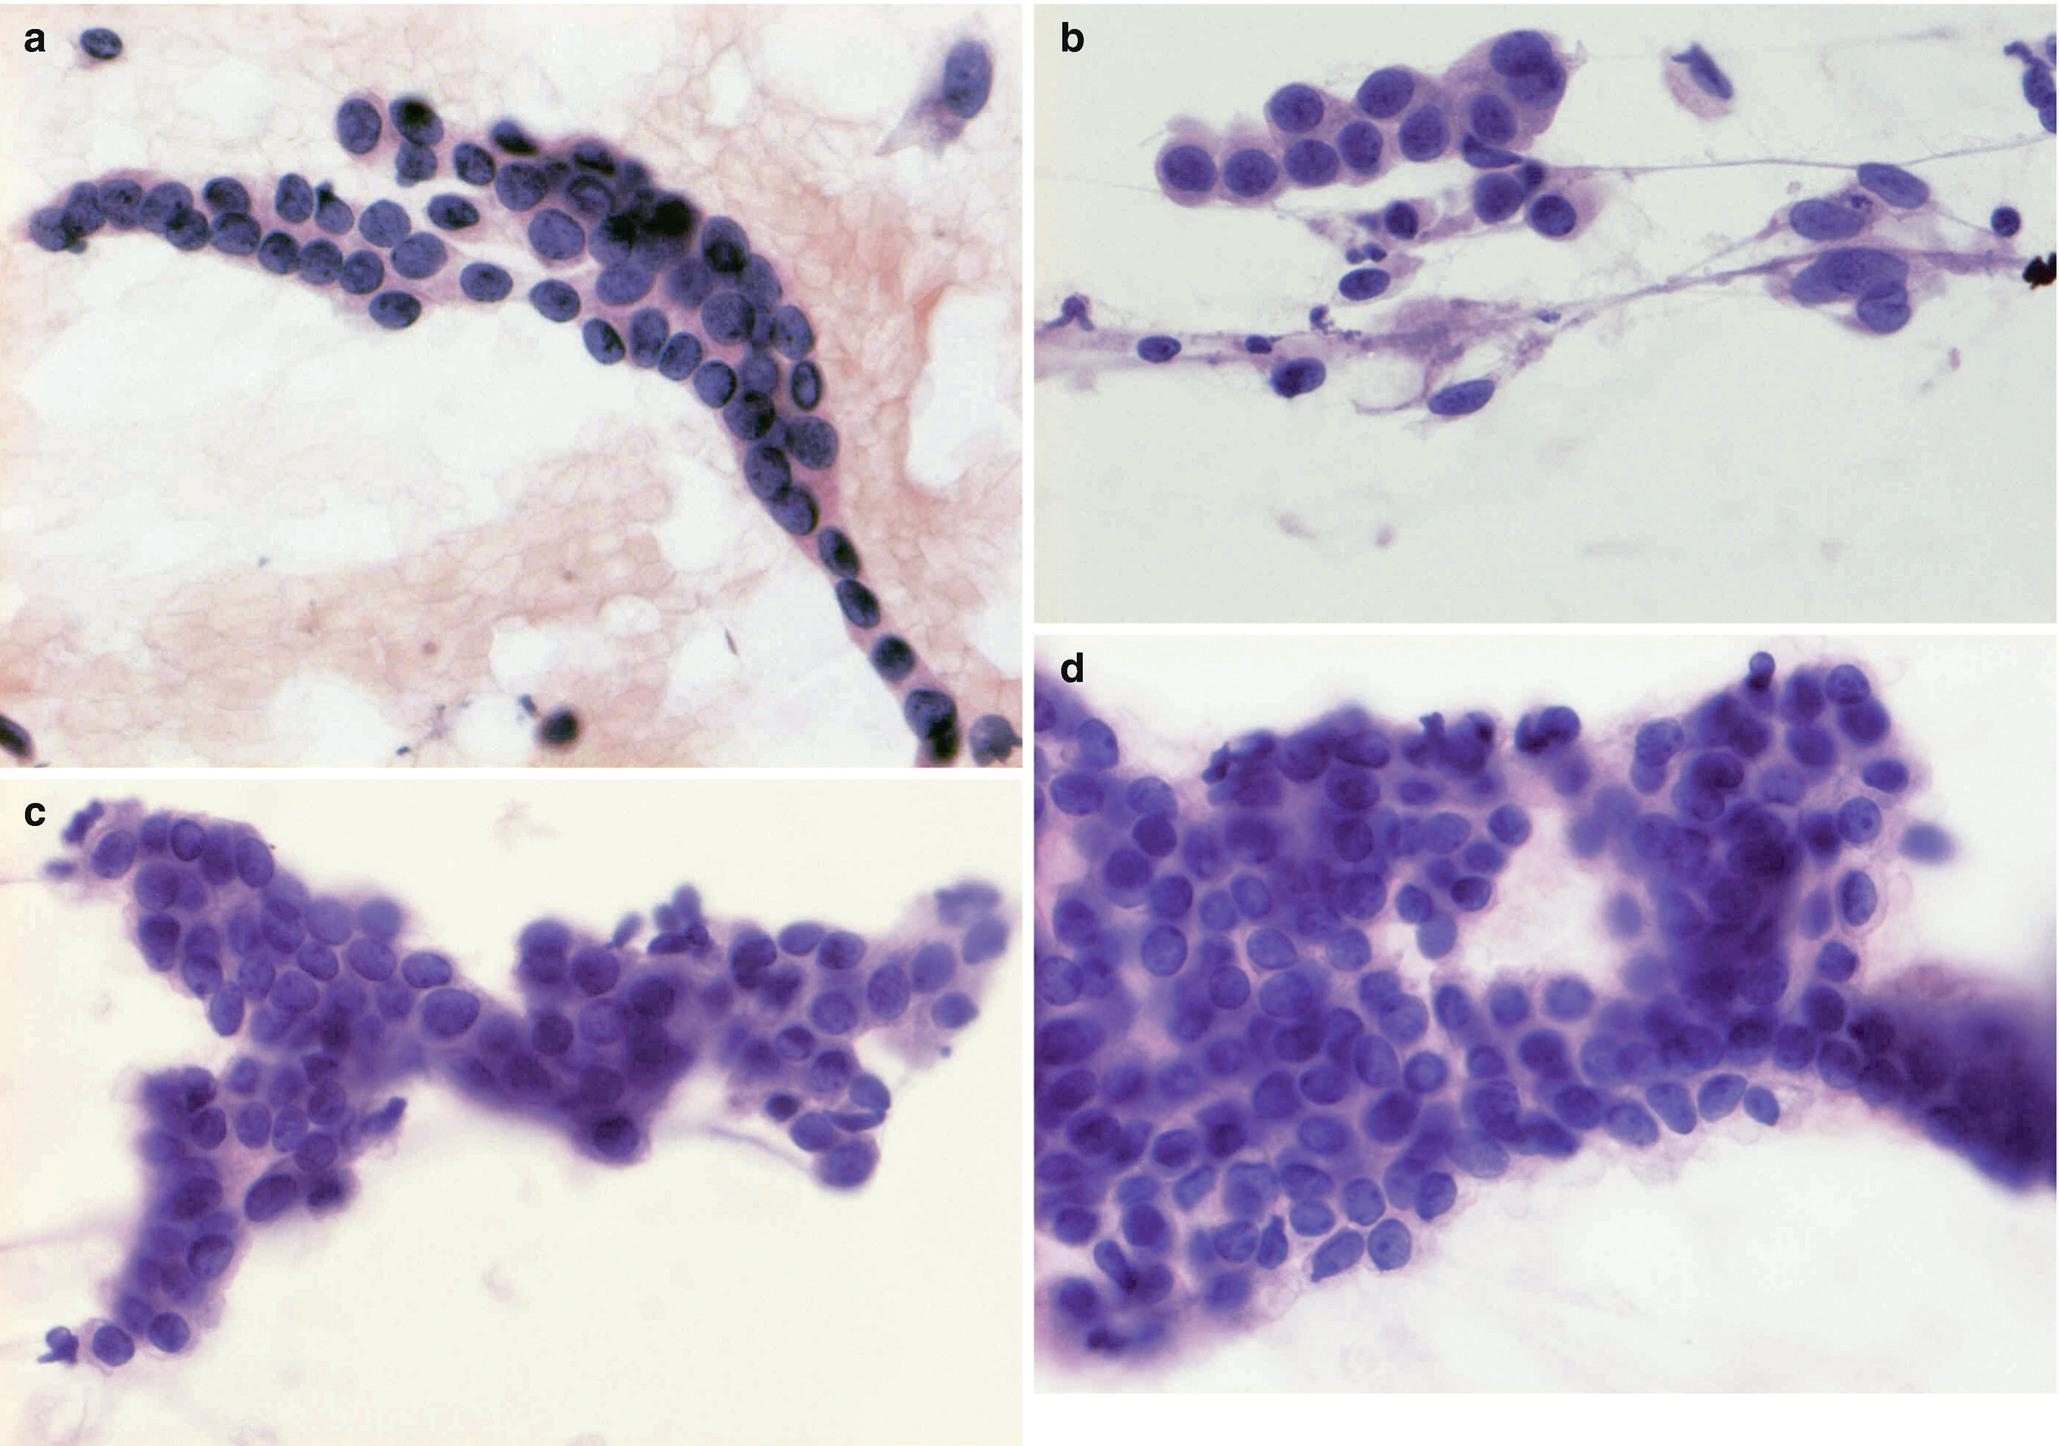 intraductalis papilloma c3